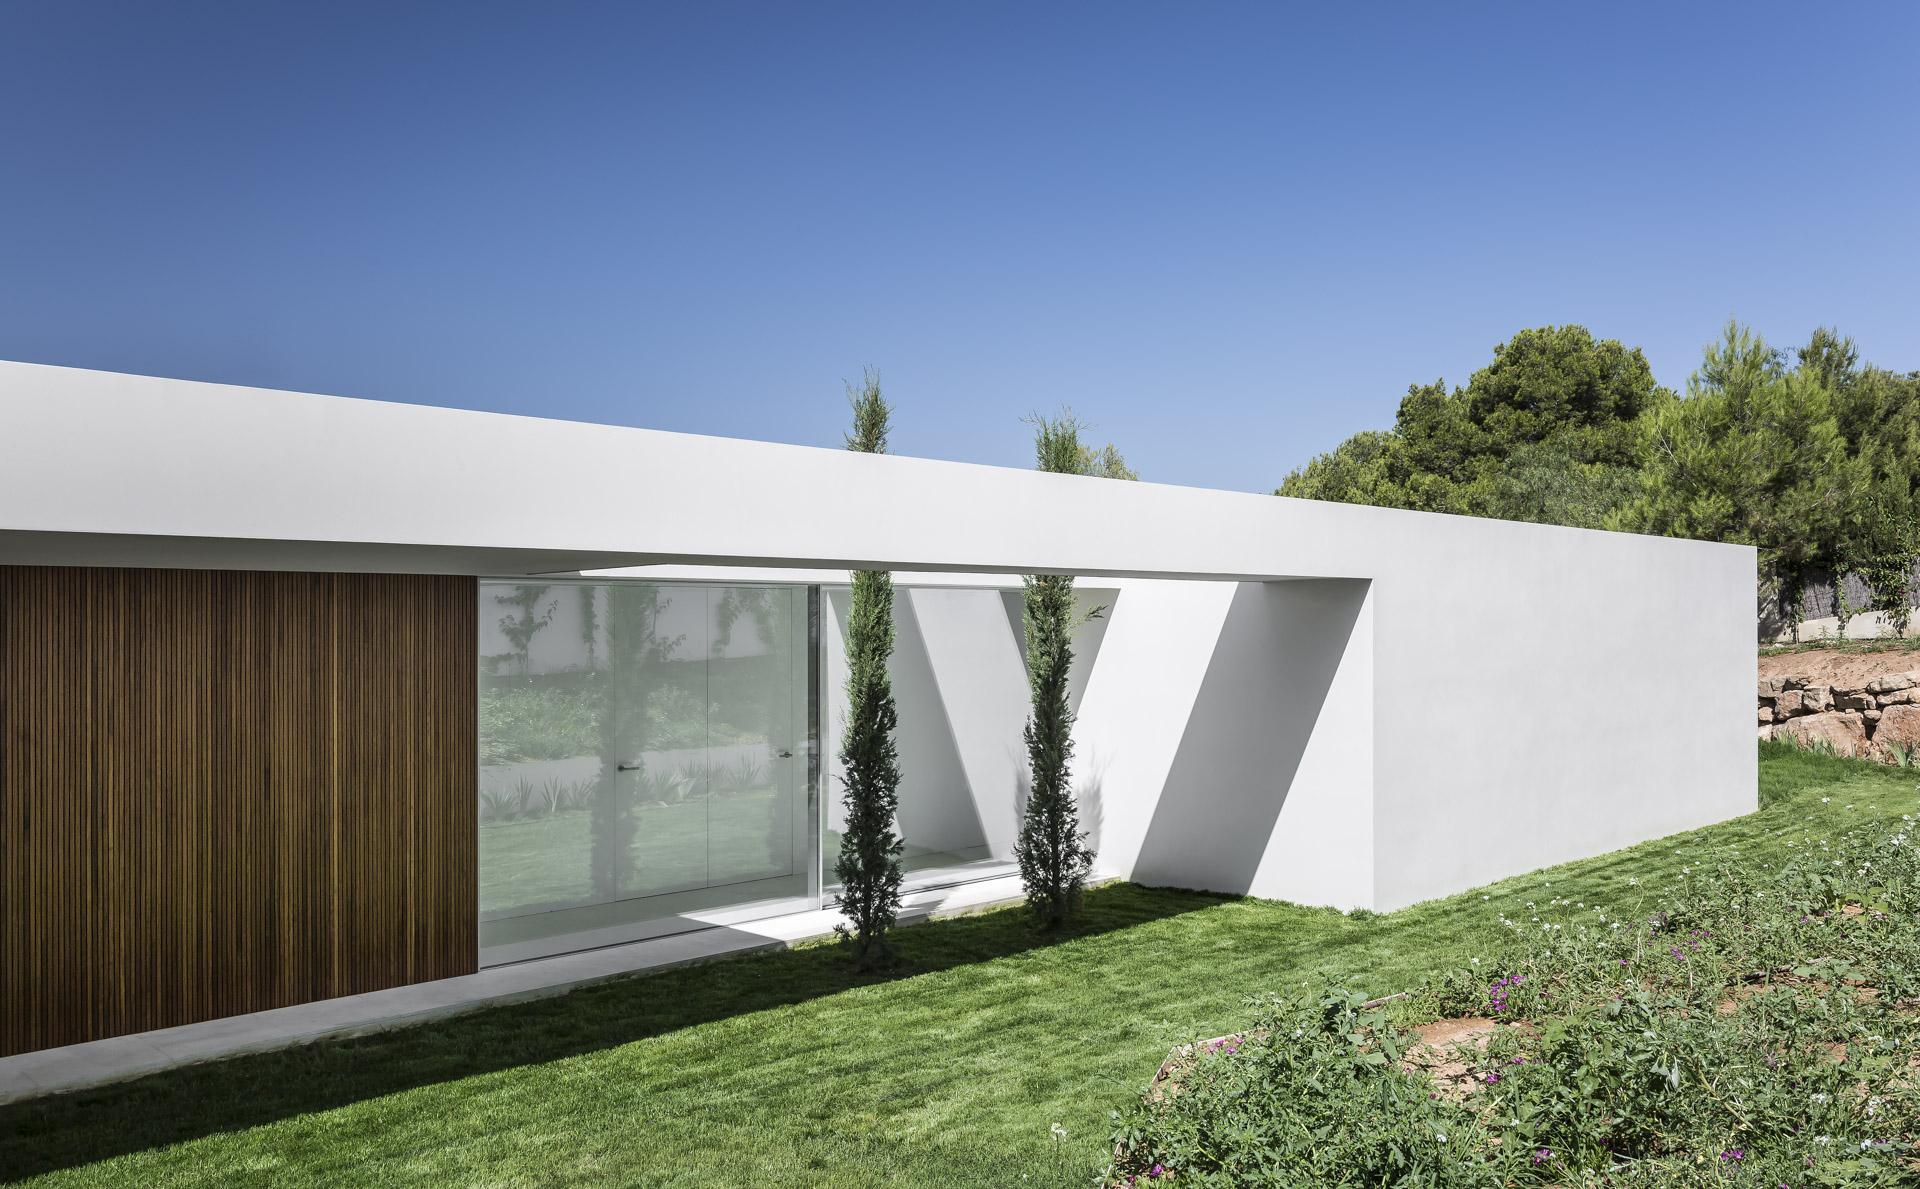 fotografia-arquitectura-valencia-german-cabo-gallardo-llopis-villamarchante-vivienda-05